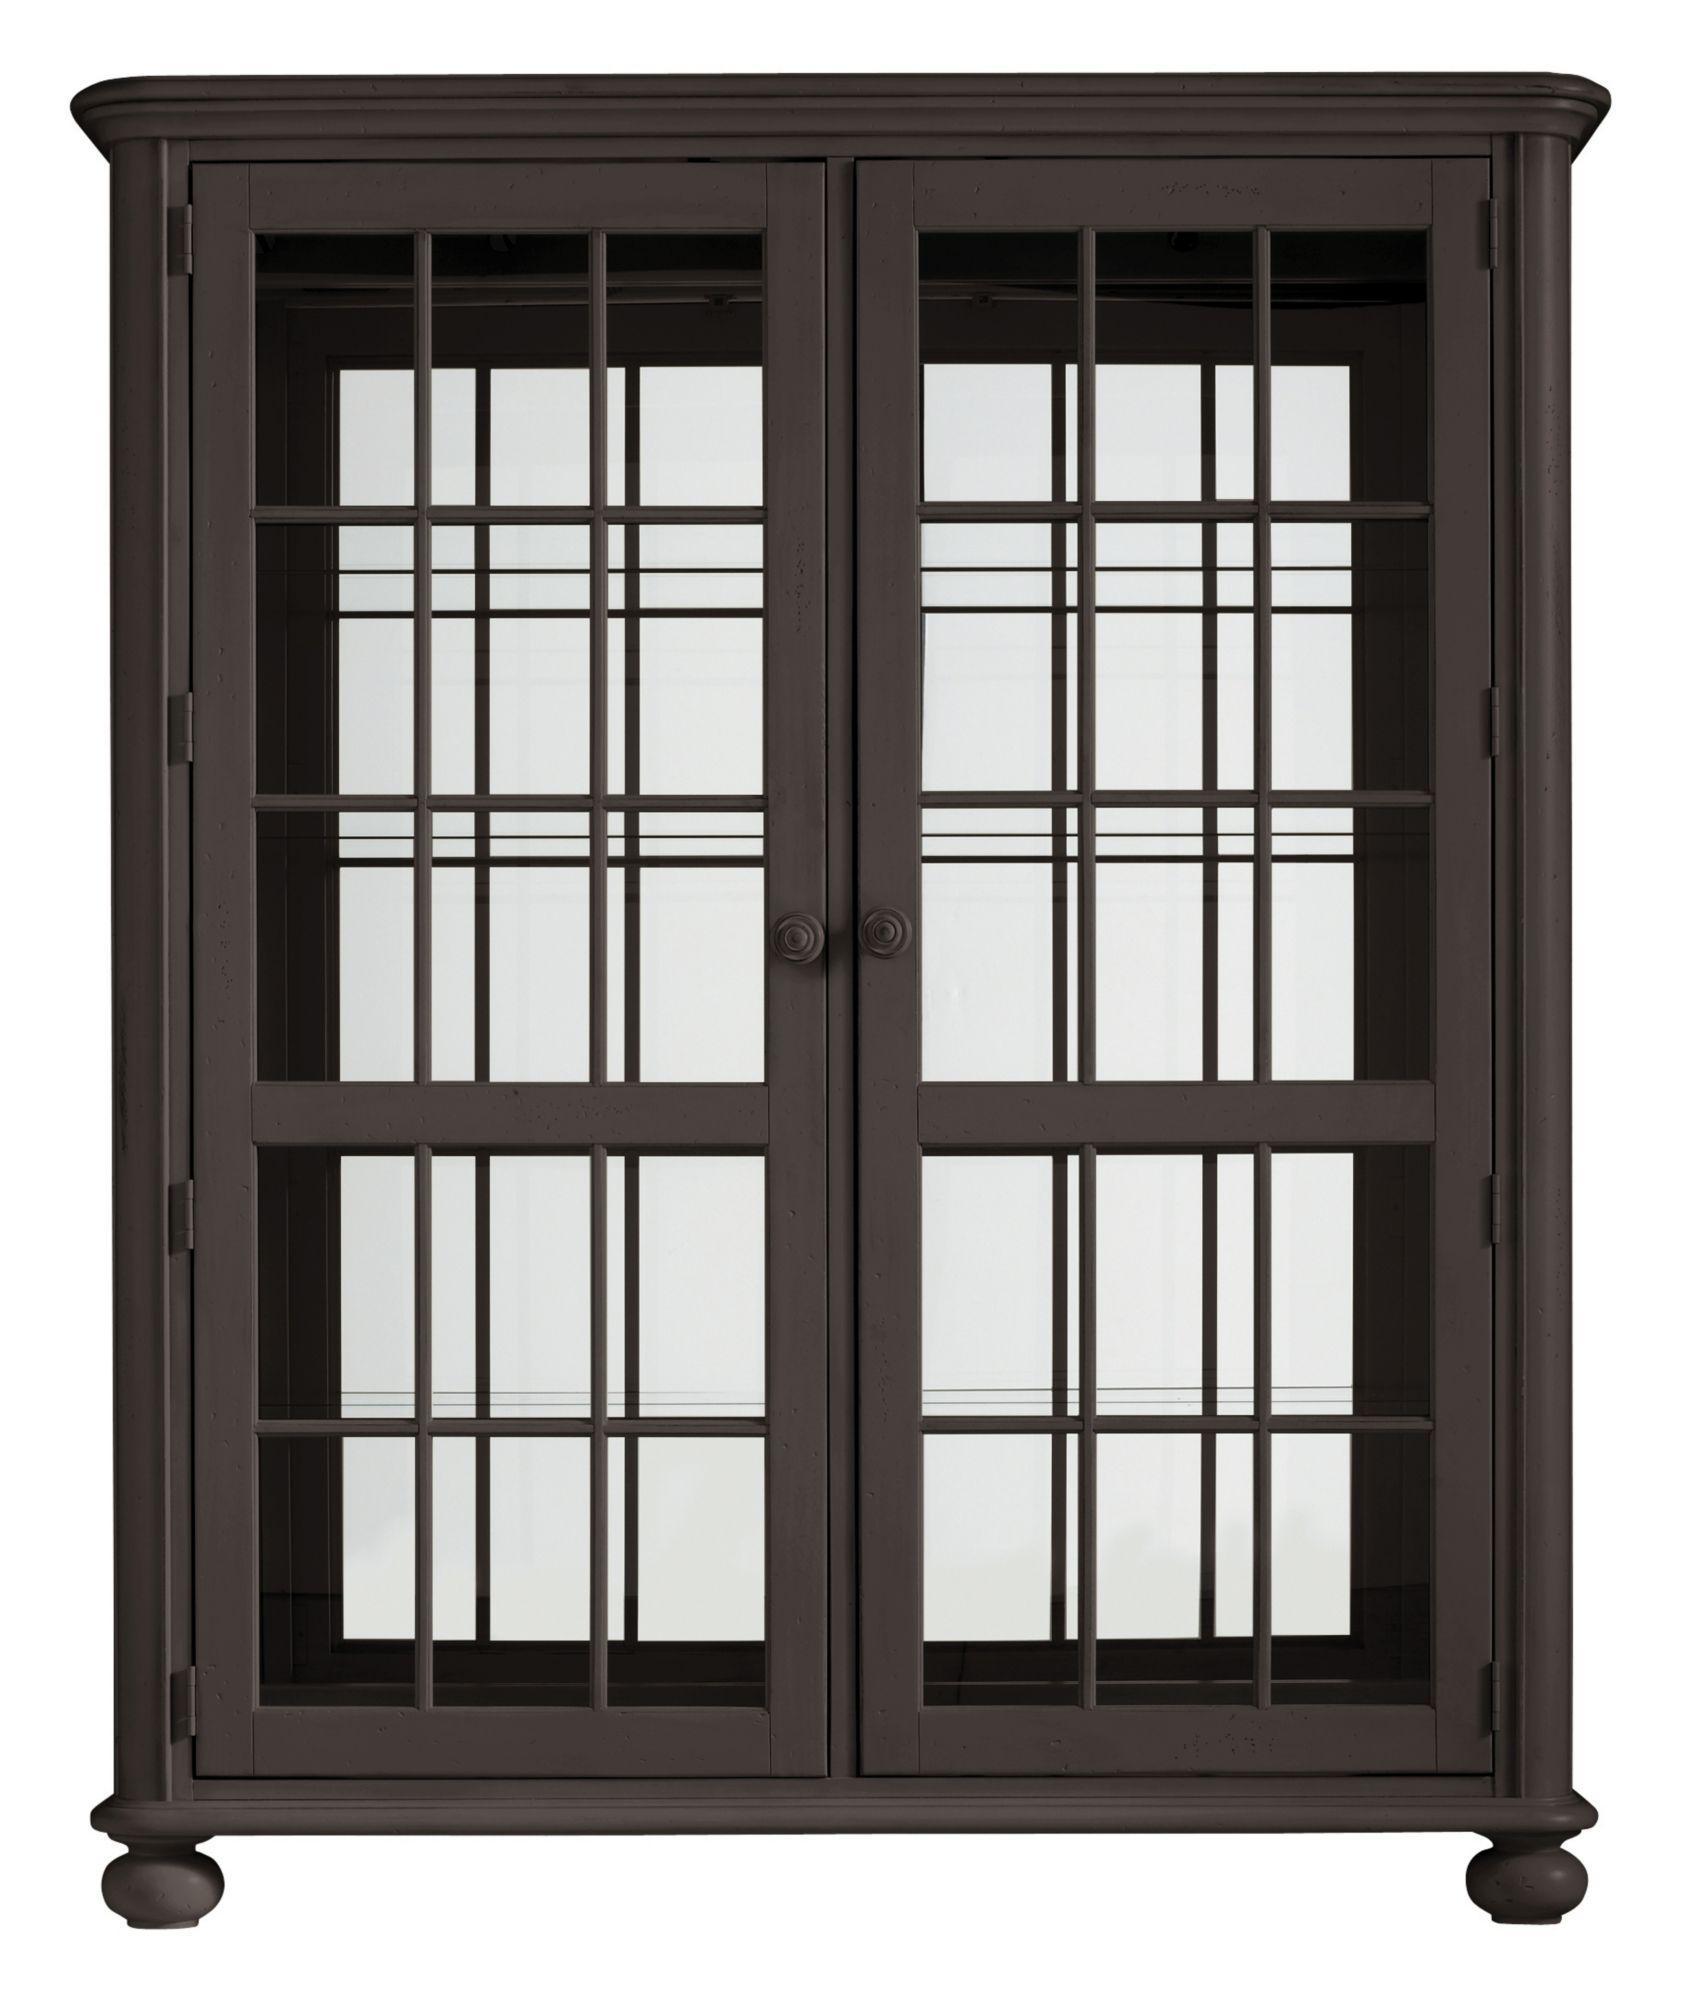 Stanley Furniture Coastal Living Retreat Newport Storage Cabinet - Item Number: 411-81-10